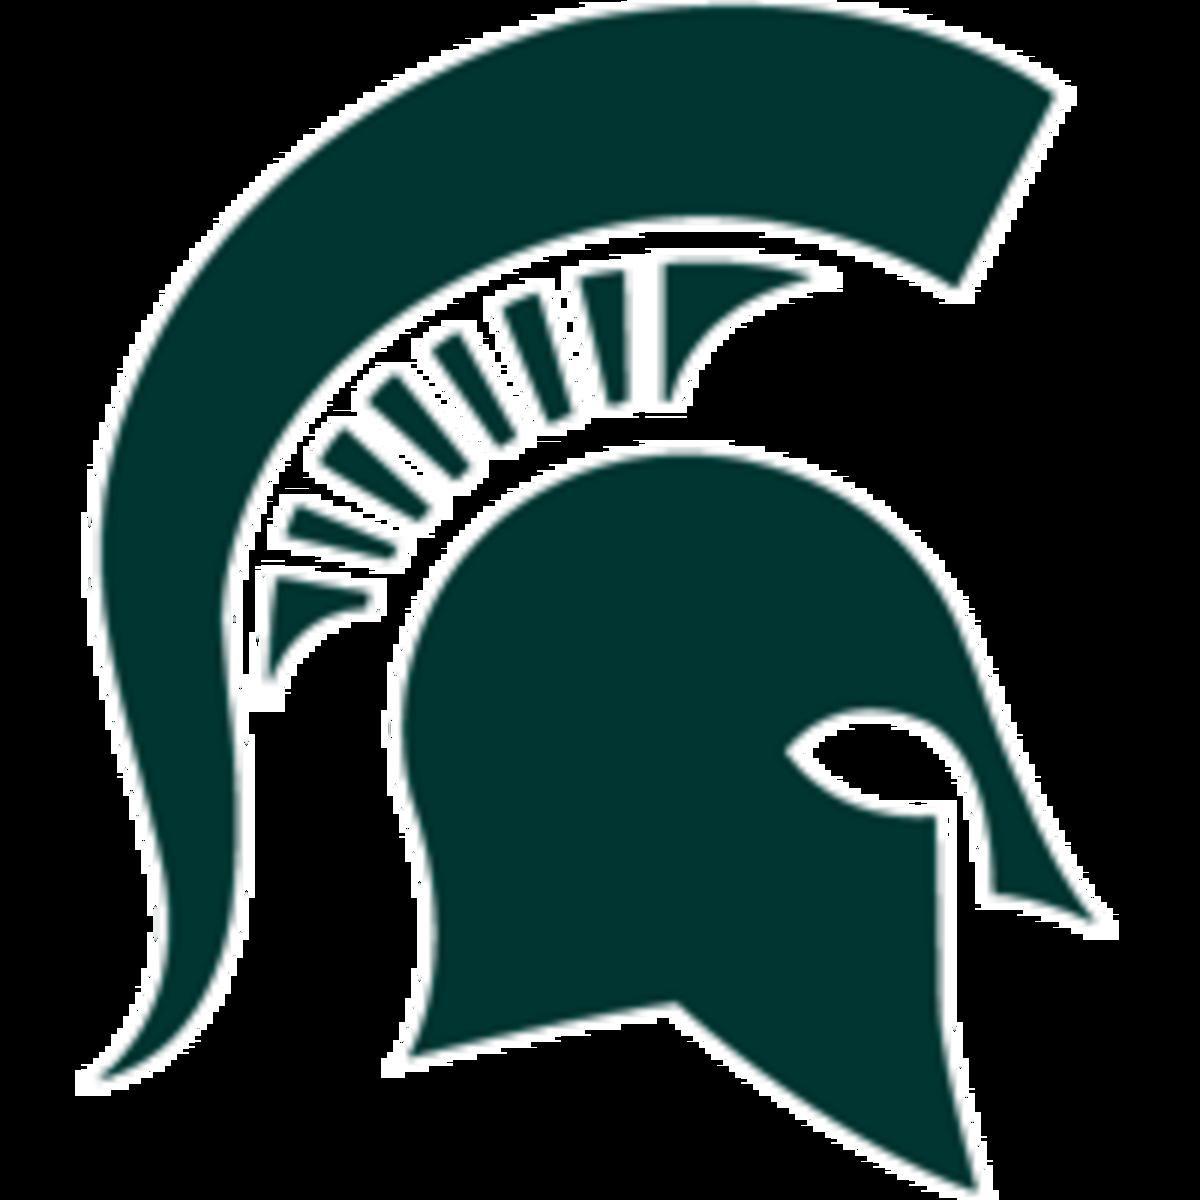 College Football Top 25 Rankings: Michigan State